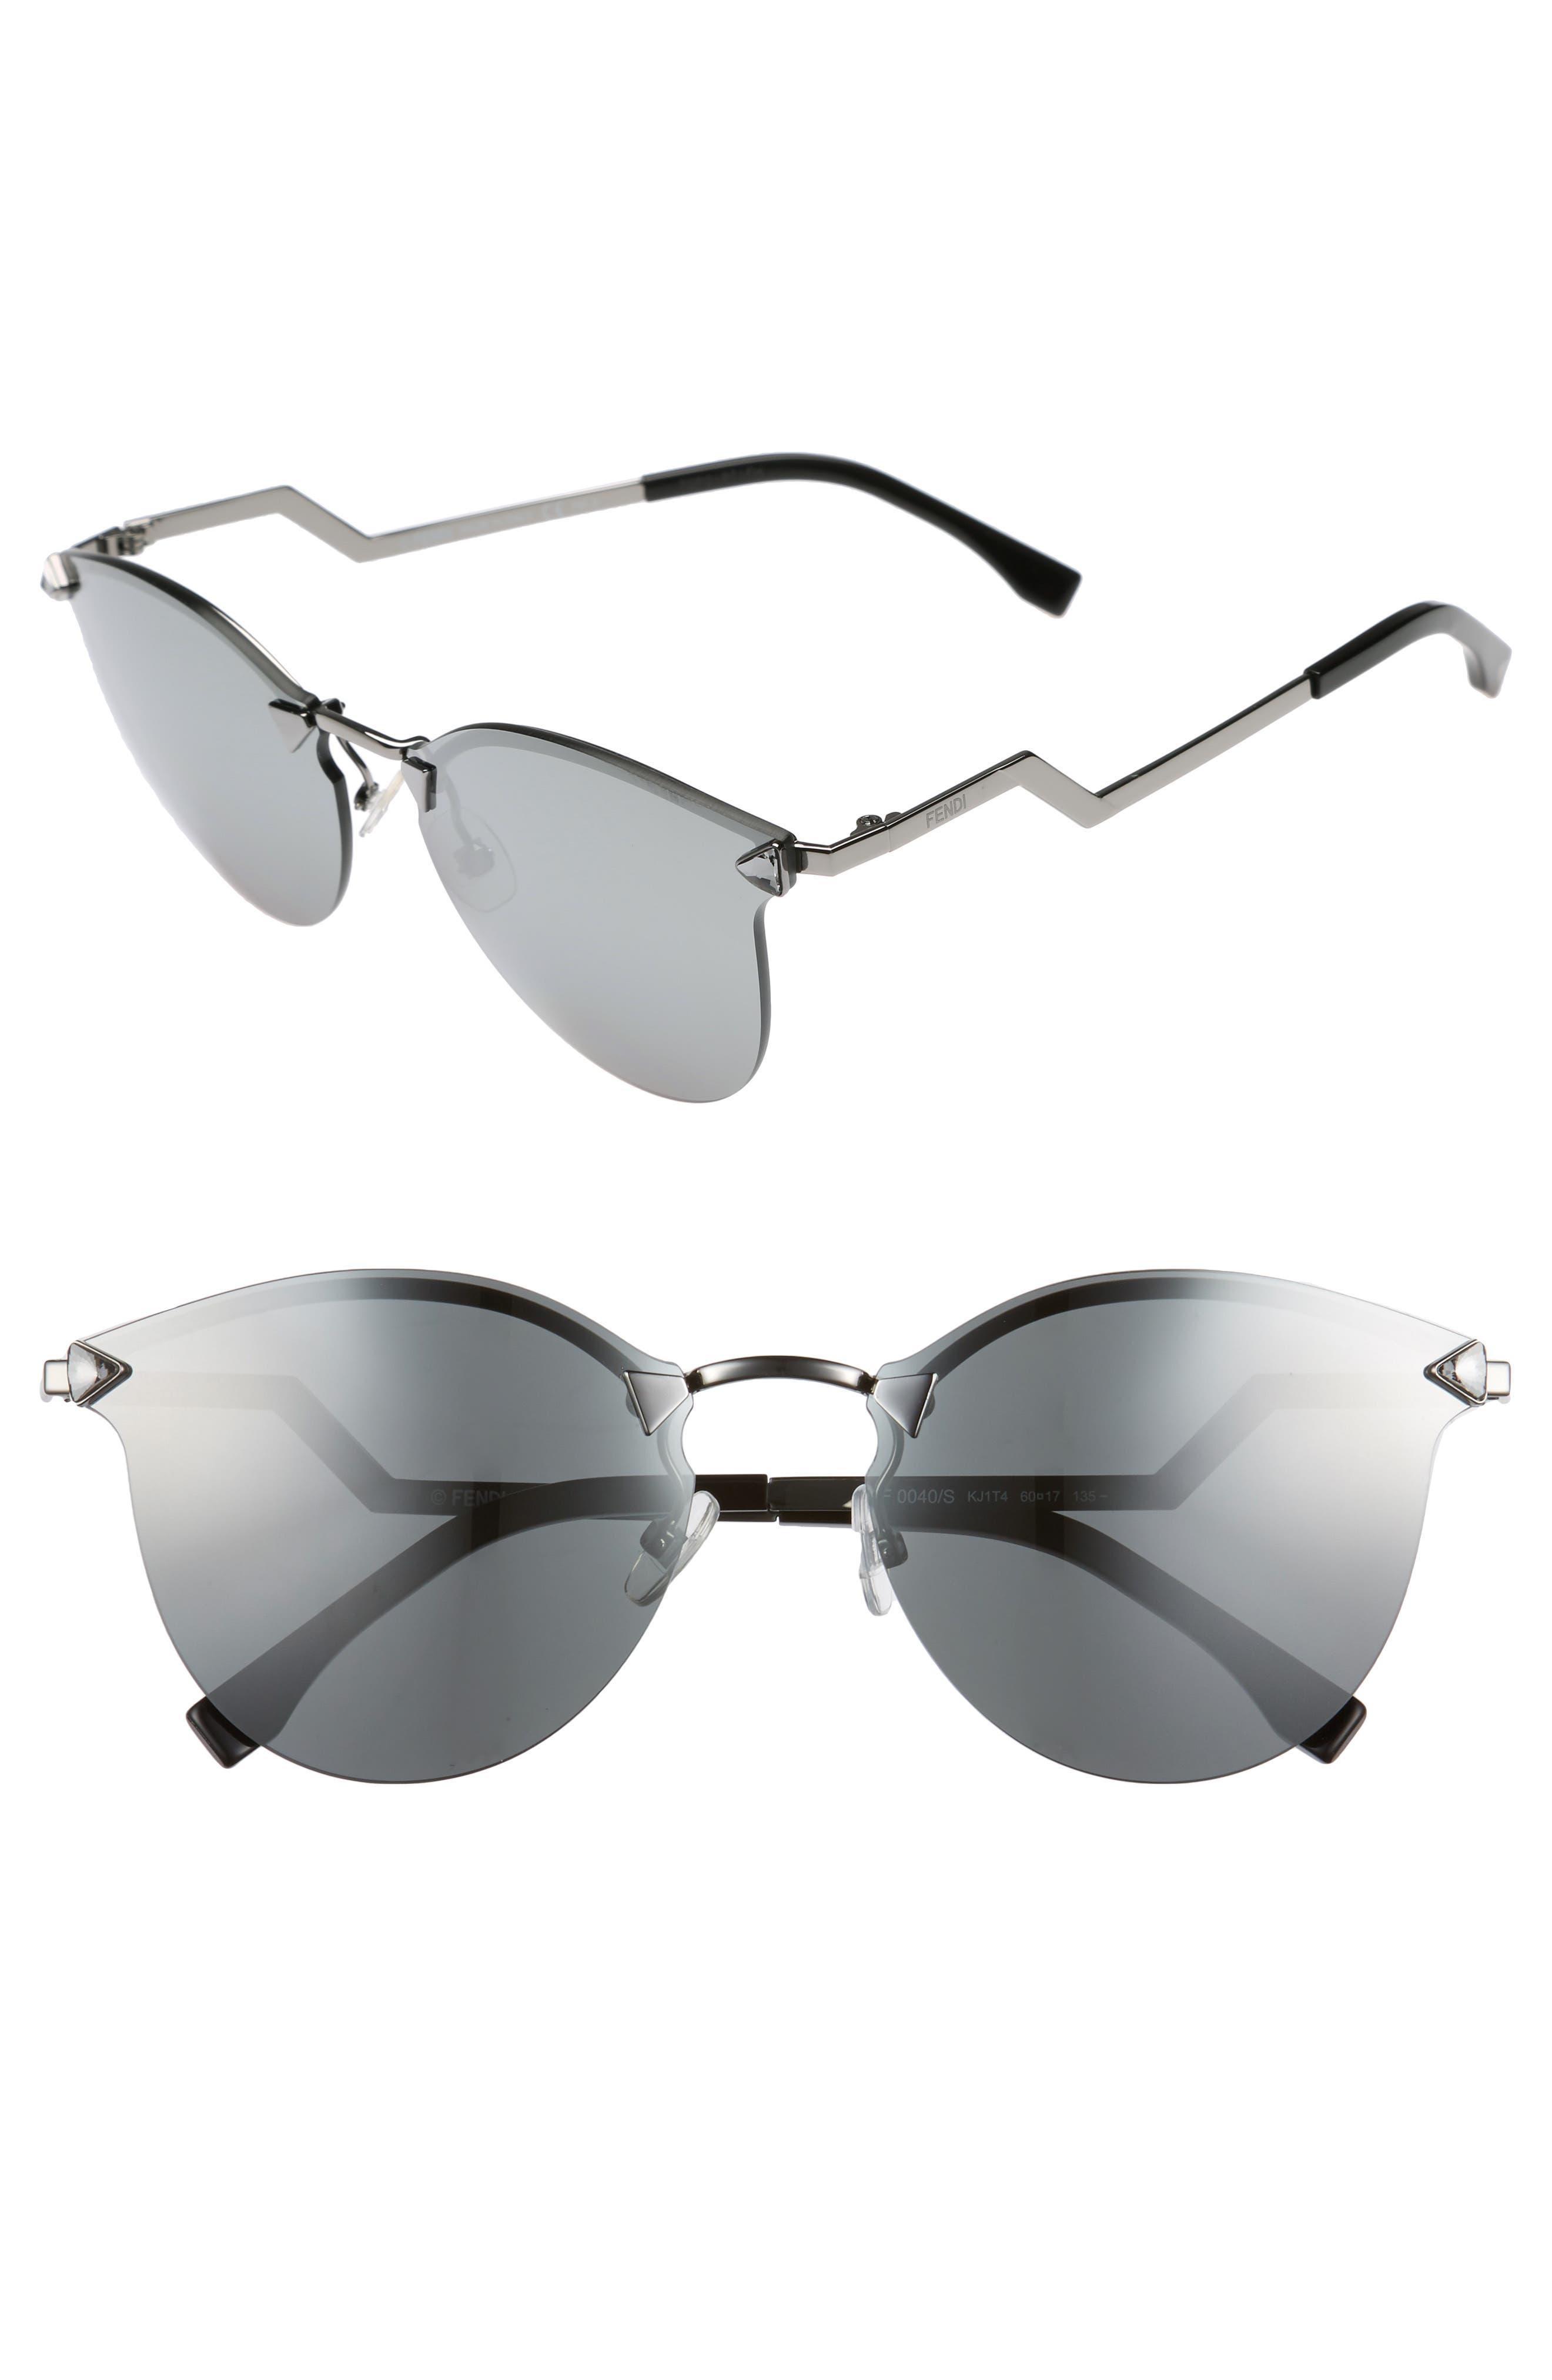 60mm Retro Sunglasses,                             Main thumbnail 1, color,                             045